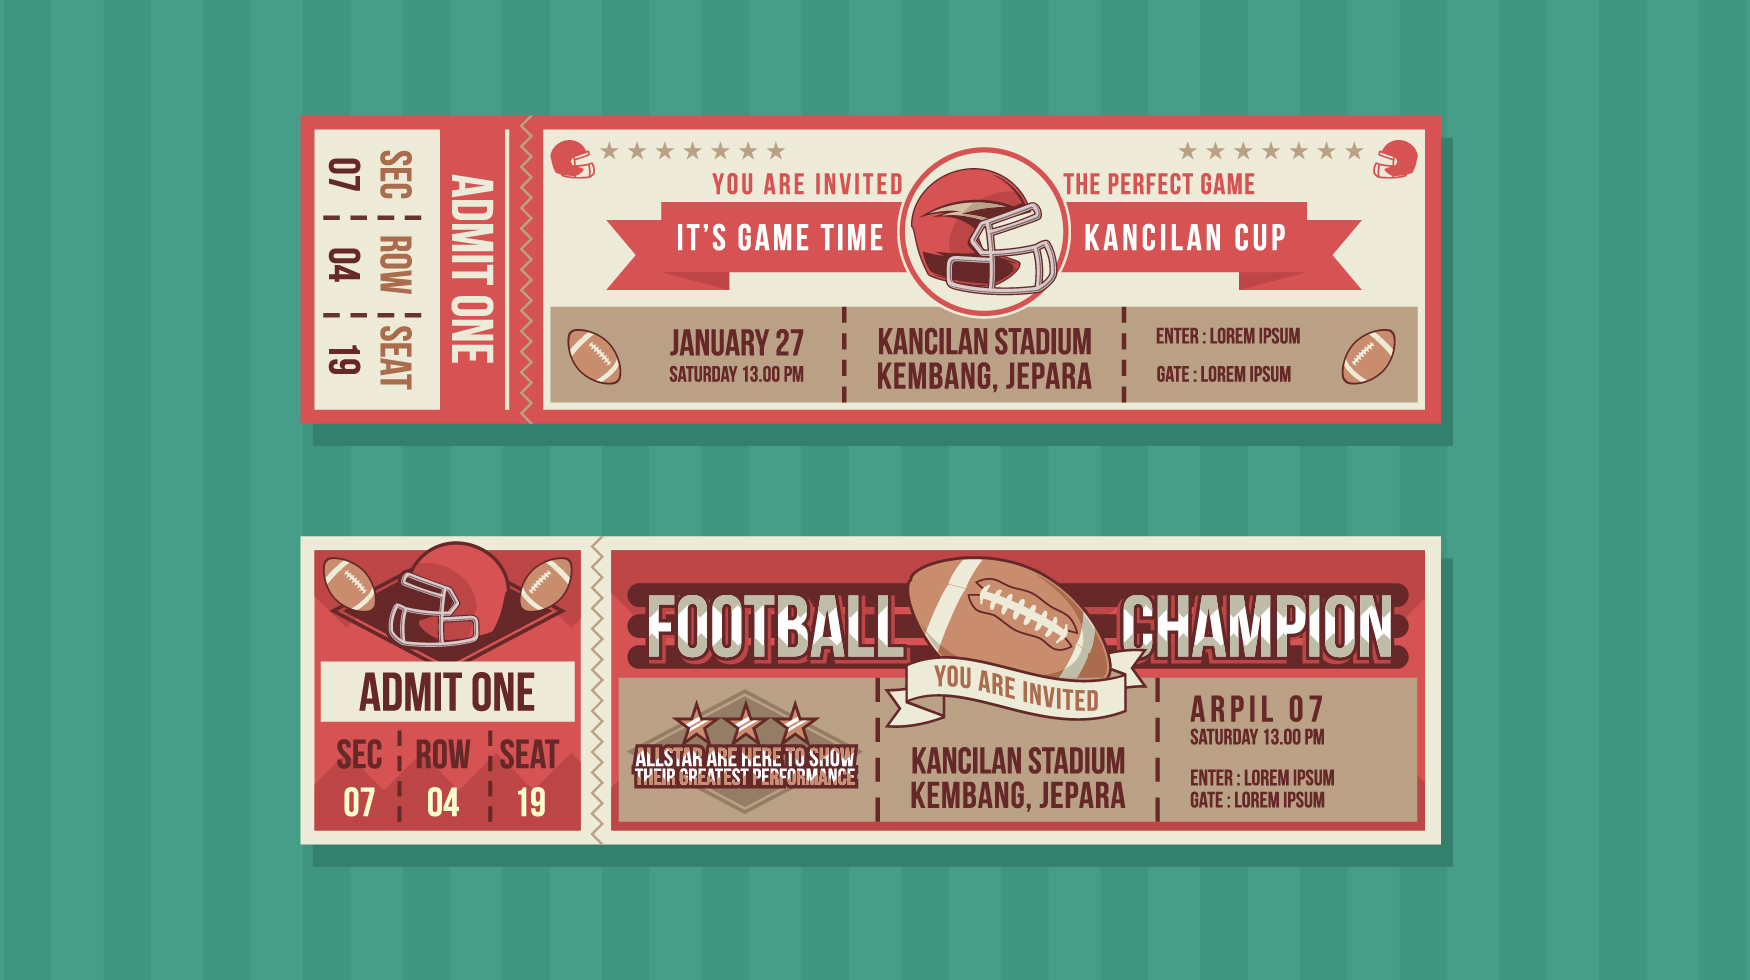 football champion event ticket free vector